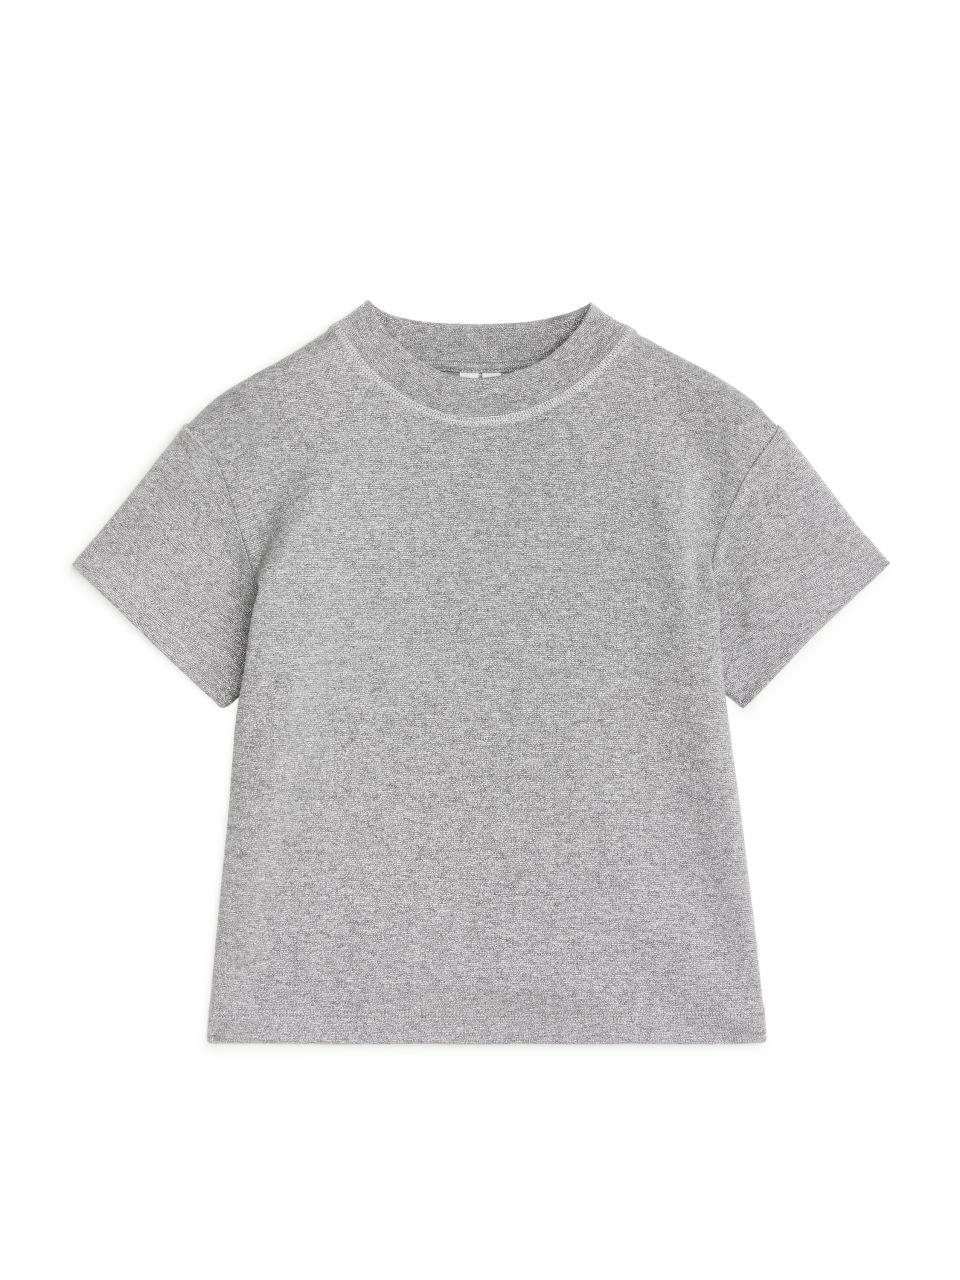 Glittery T-Shirt - Grey